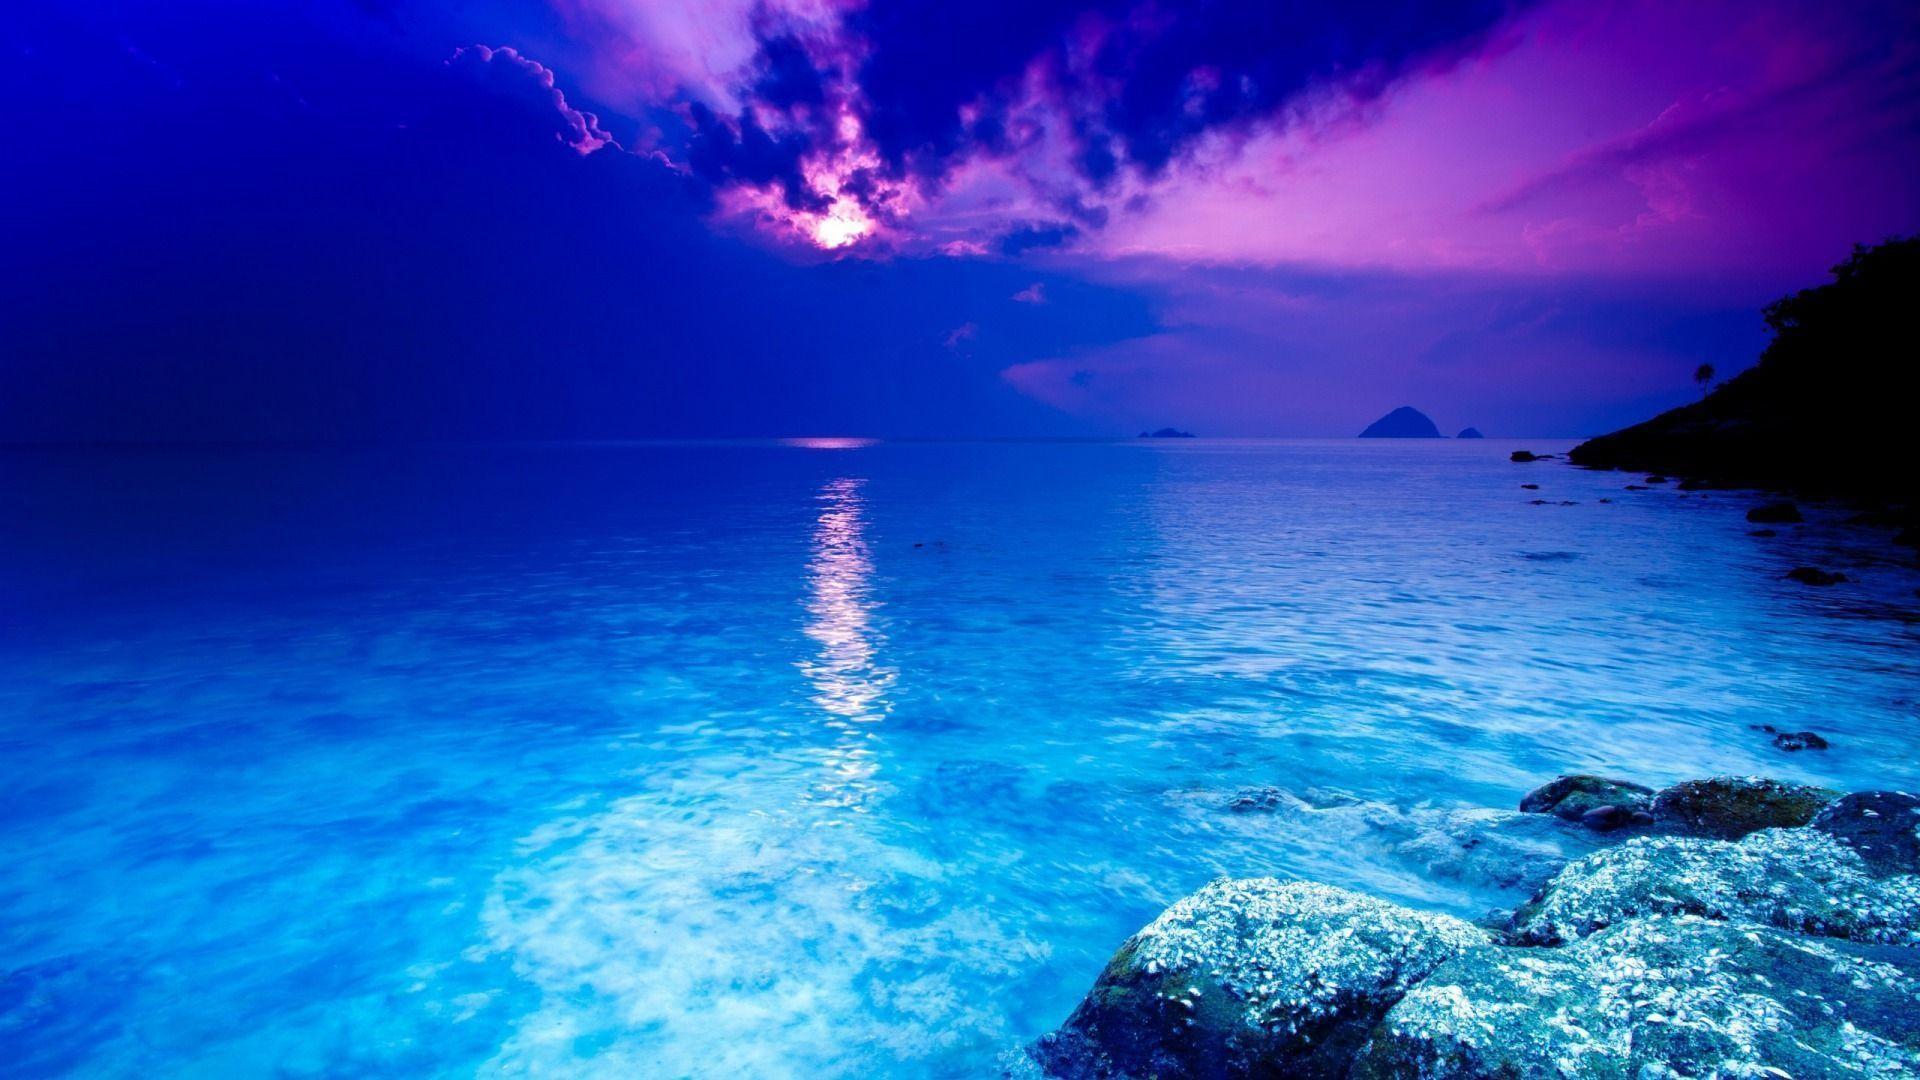 Res: 1920x1080, Blue Ocean HD Wallpapers - HD Wallpapers Inn